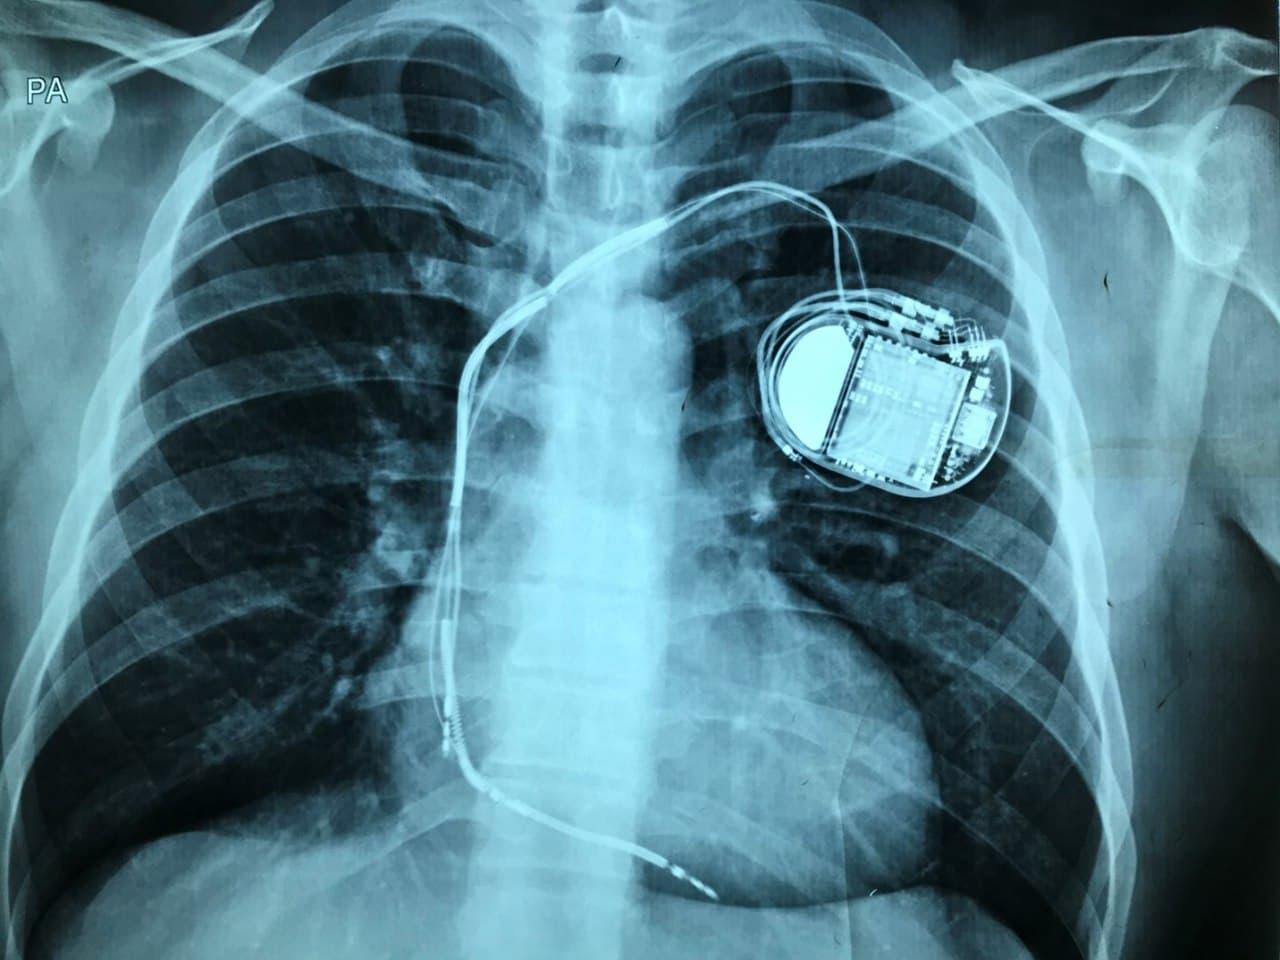 Paciente afectado de miocardiopatía hipertrófica portador de CDI que presenta múltiples descargas del dispositivo por fractura del electrodo